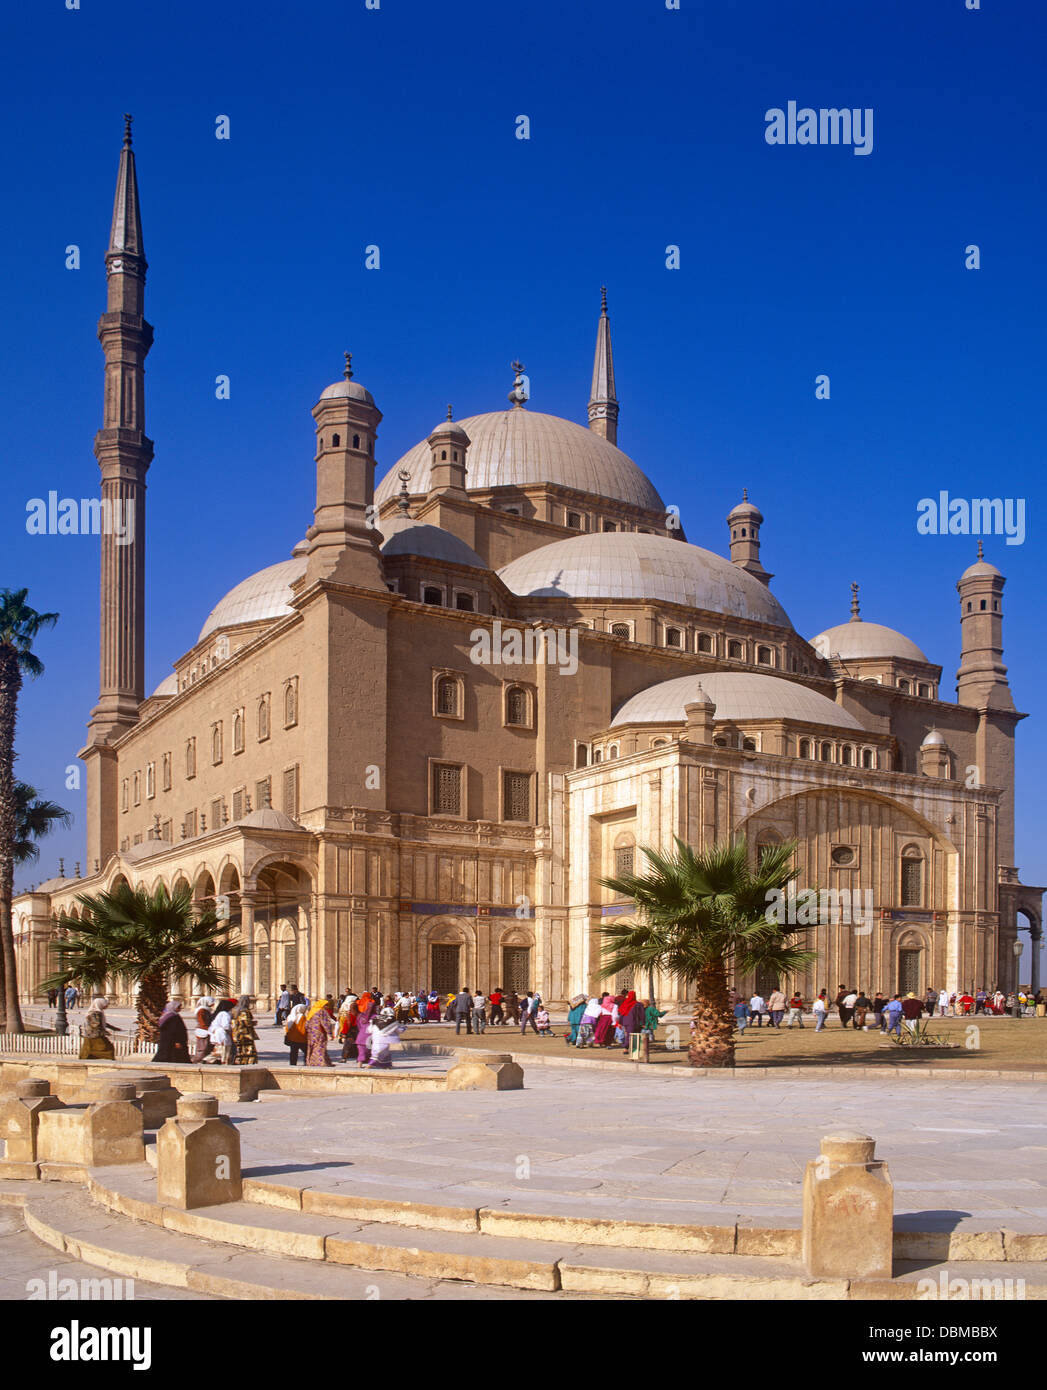 Muhammad Ali Mosque, Cairo, Egypt - Stock Image